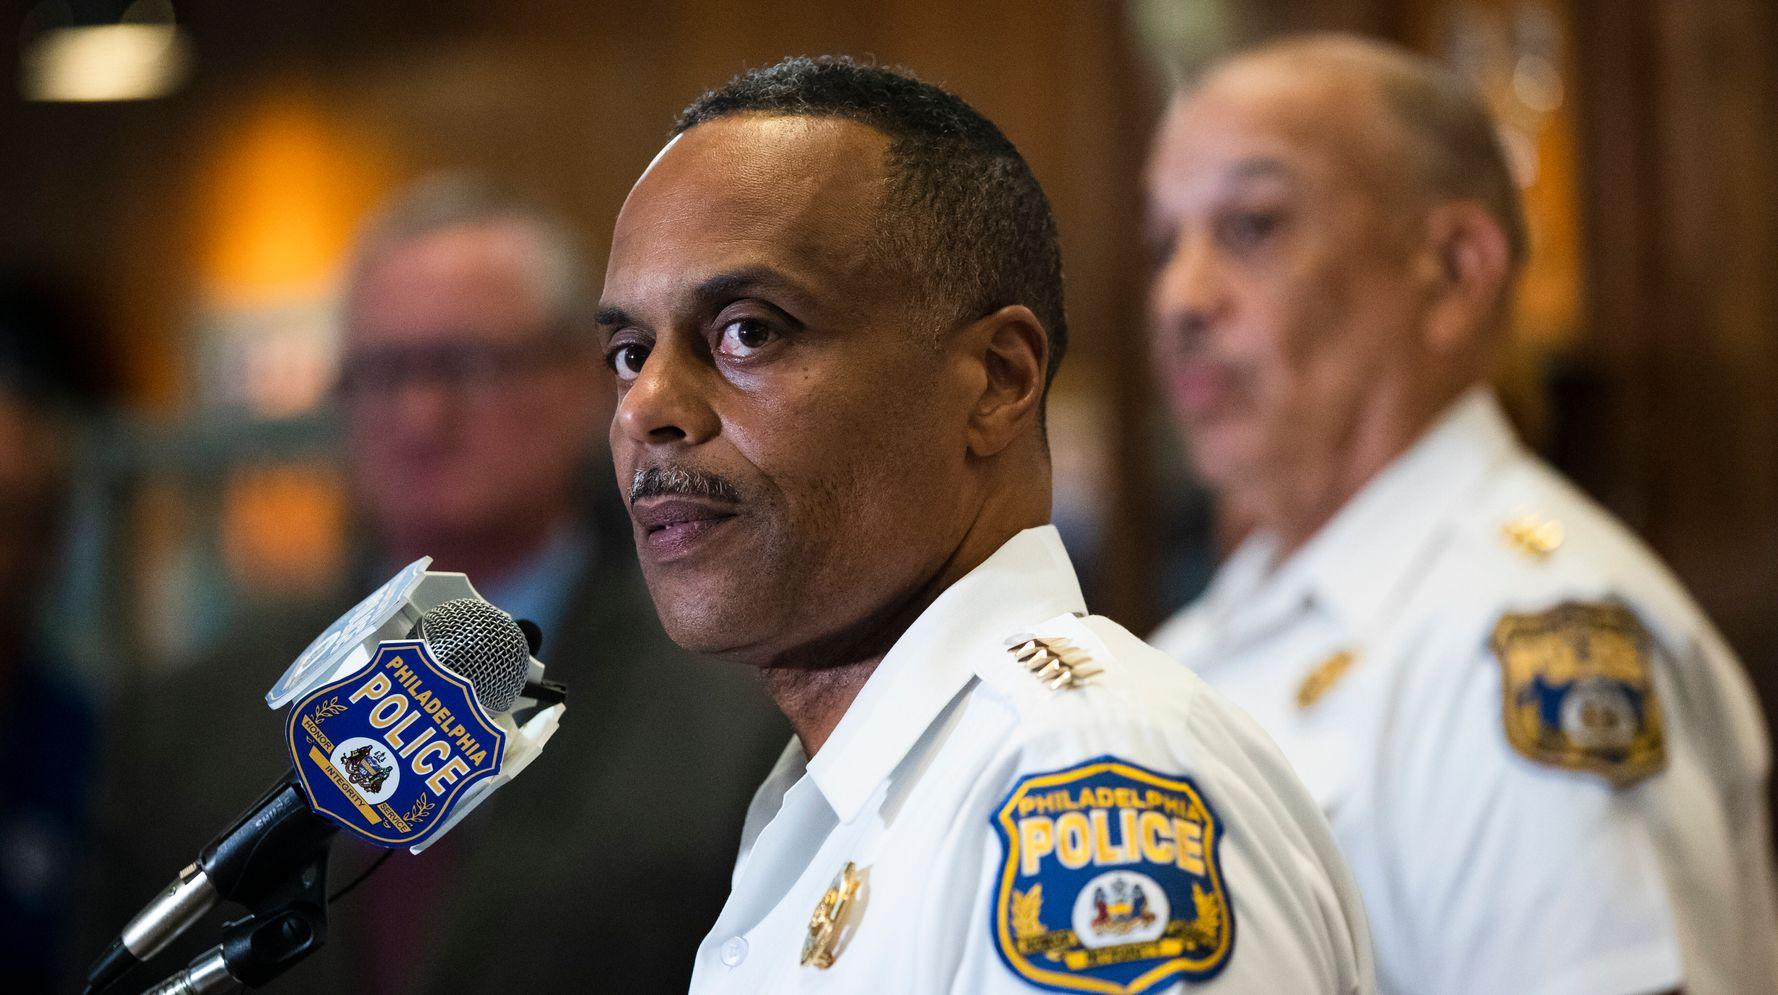 Philadelphia Police Commissioner Resigns Over Handling Of Harassment Allegations